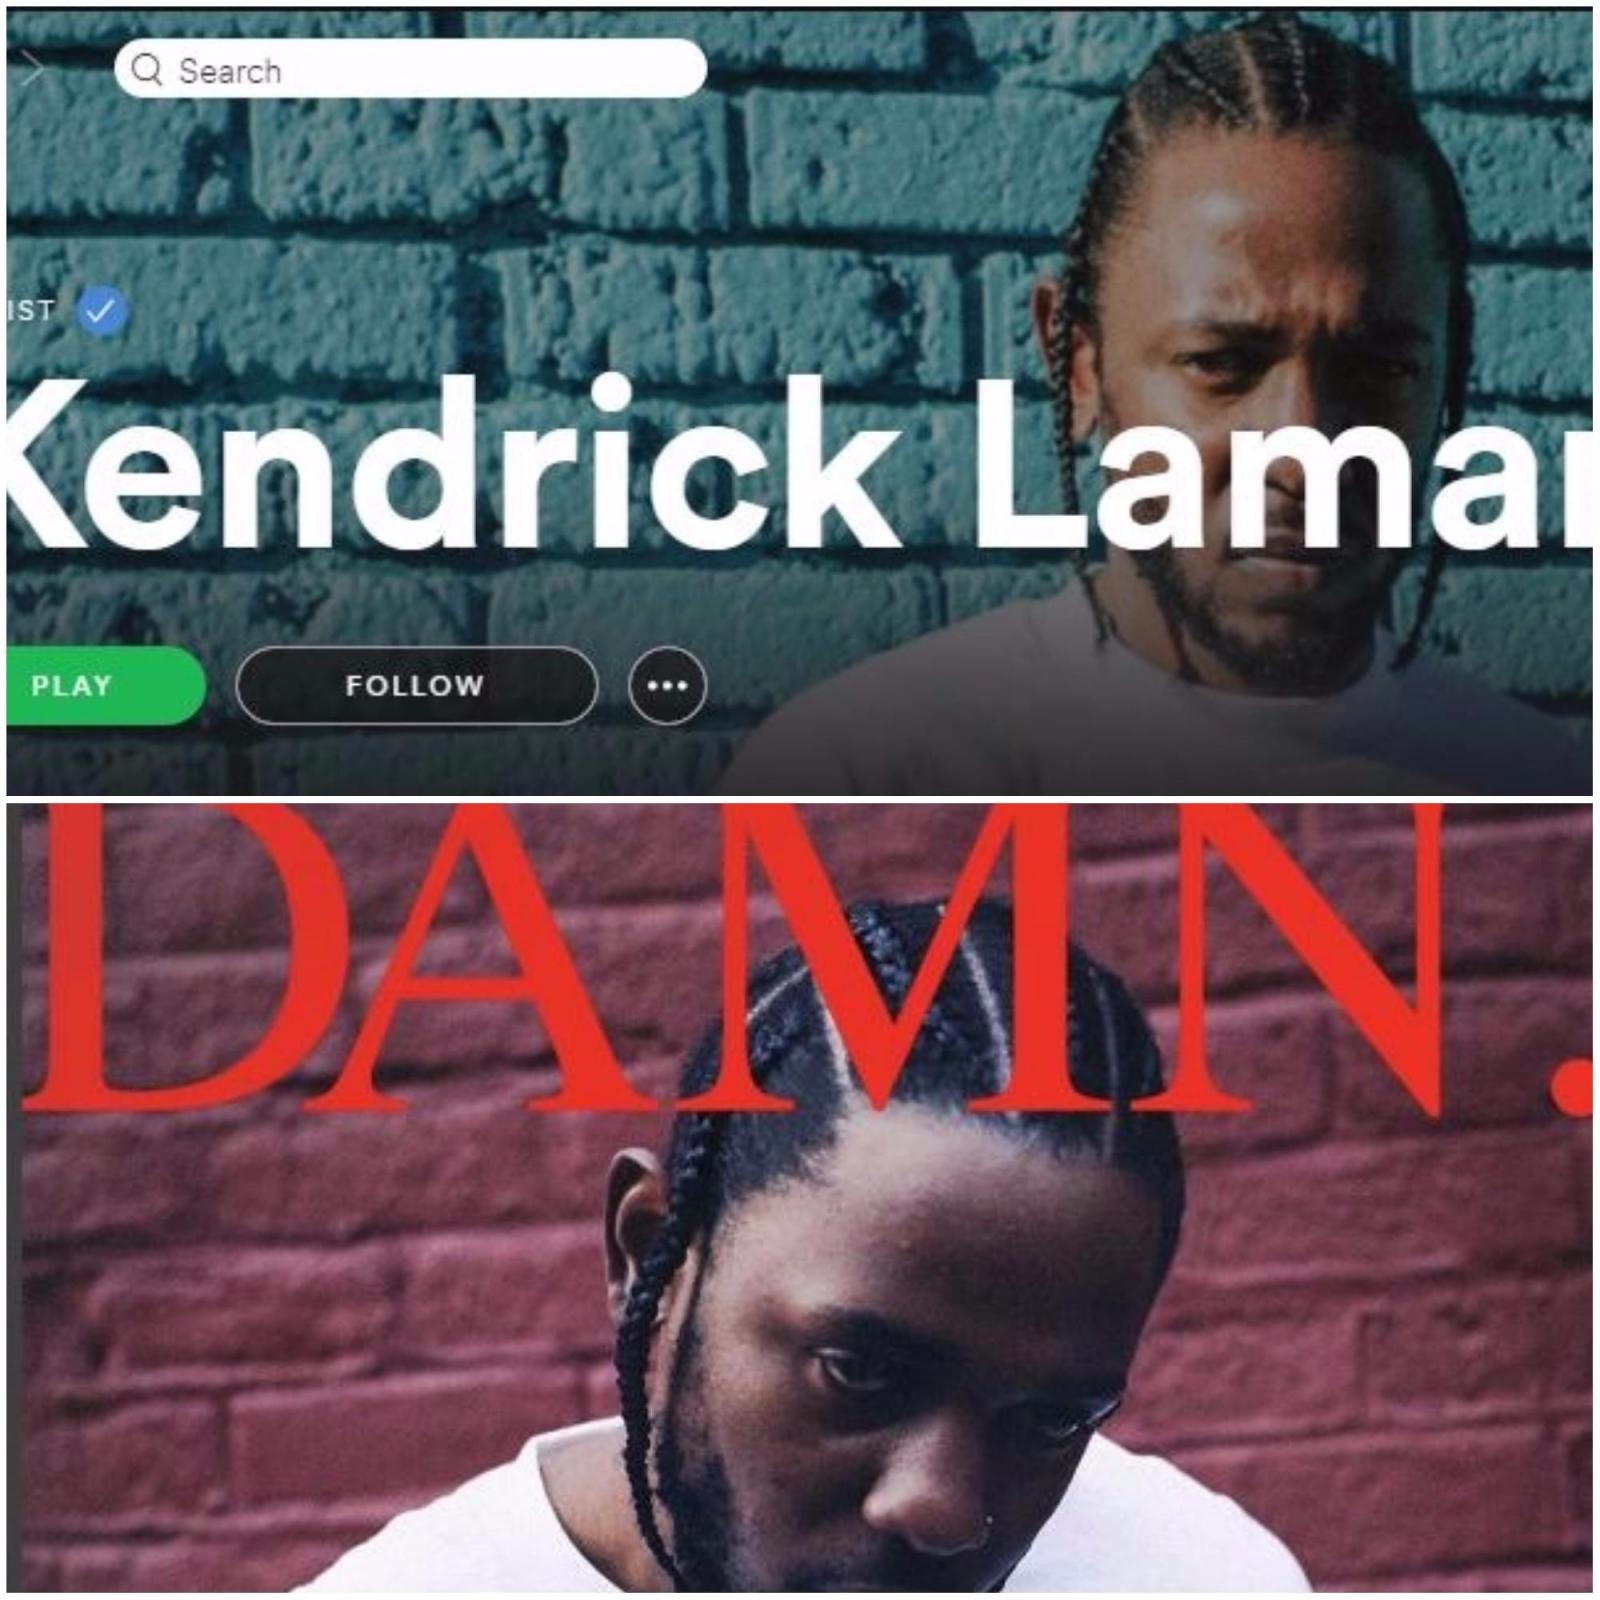 Kendrick Lamar new album?